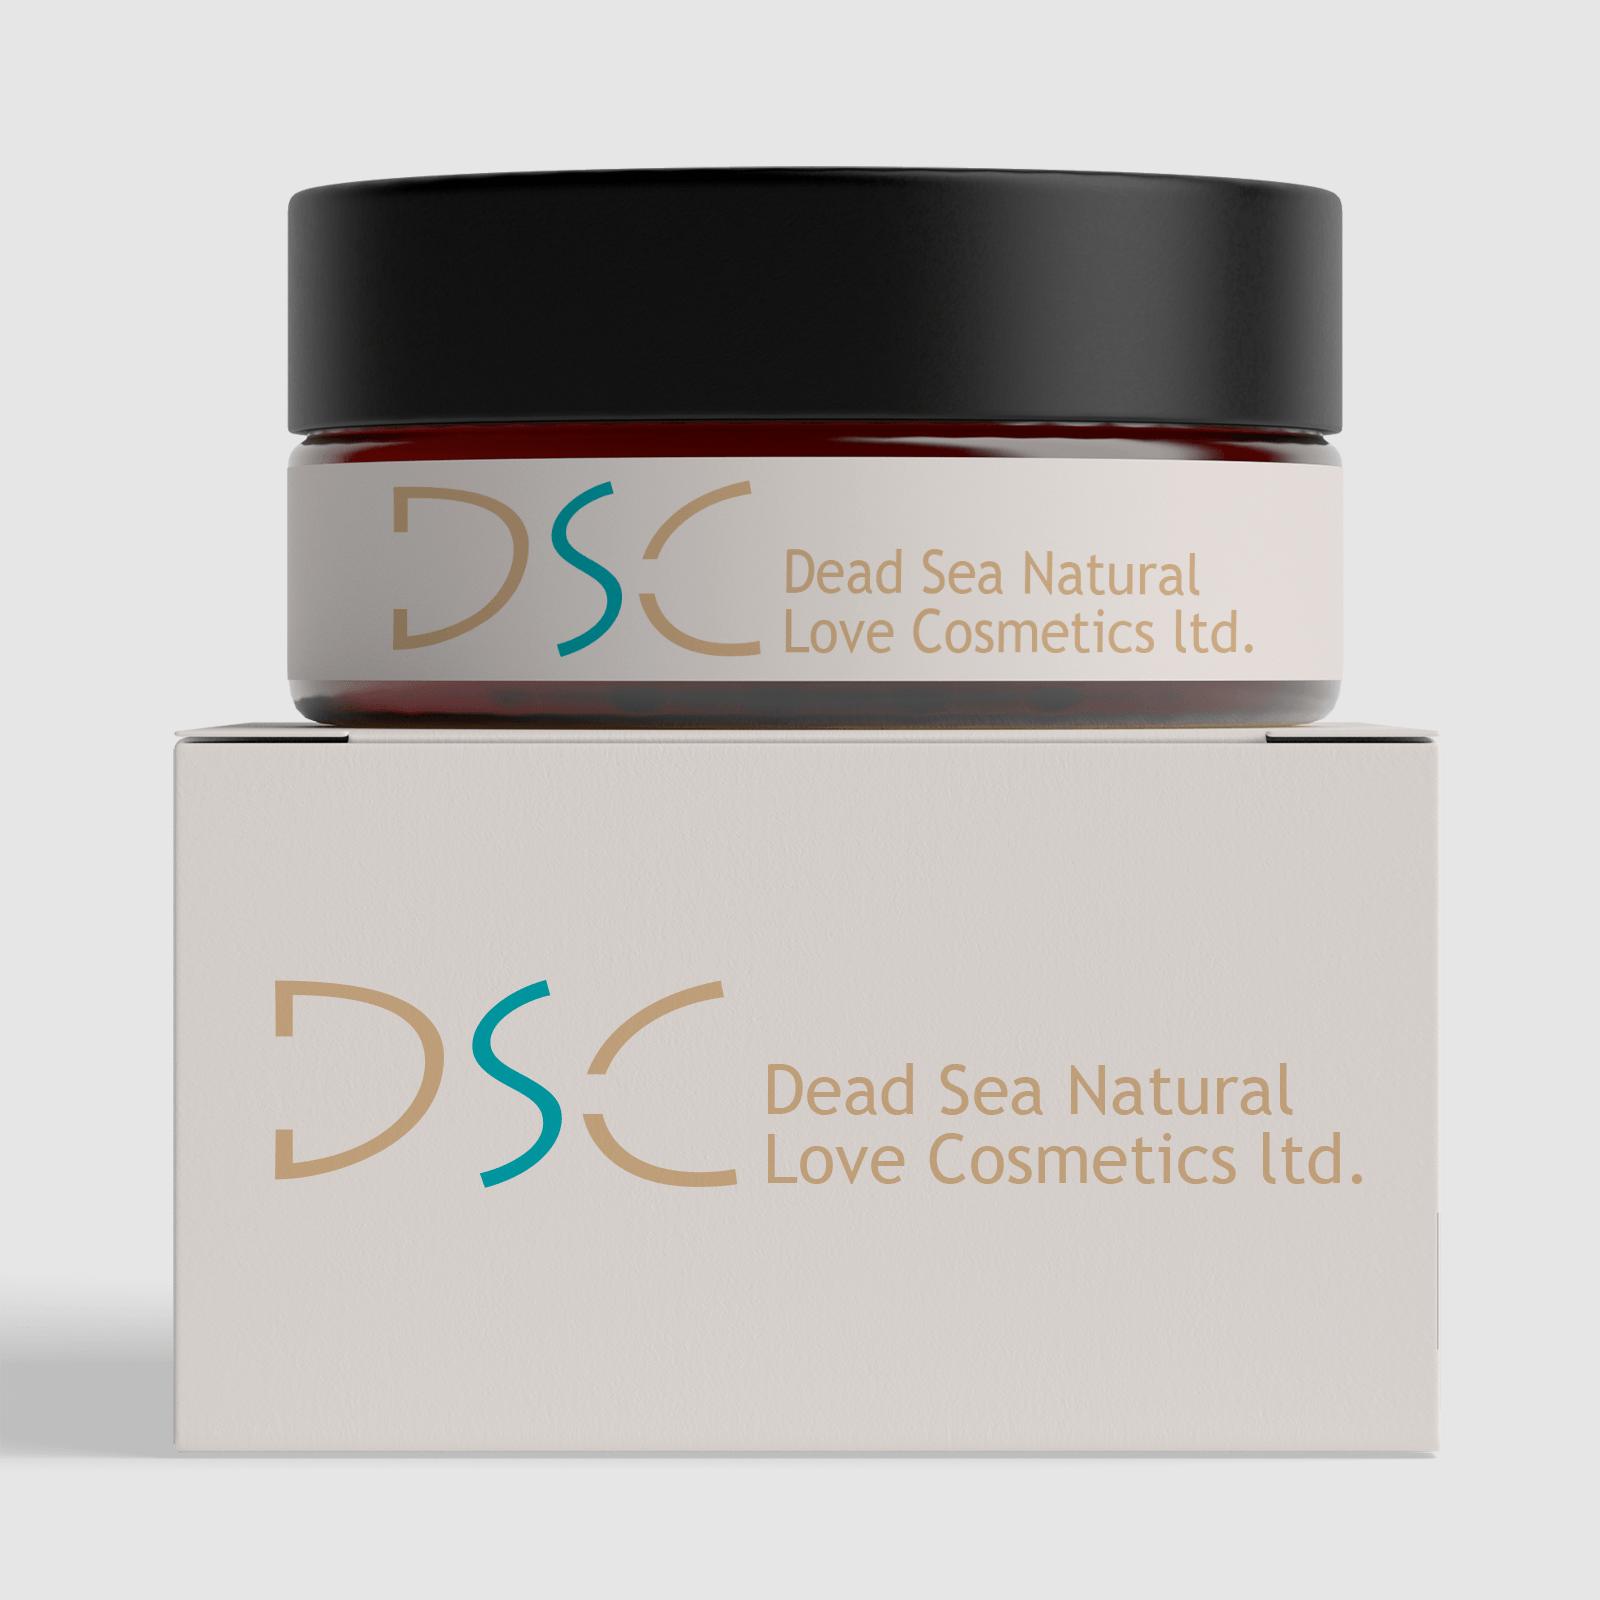 DSC - עיצוב לוגו לחברת שיווק למוצרי קוסמטיקה